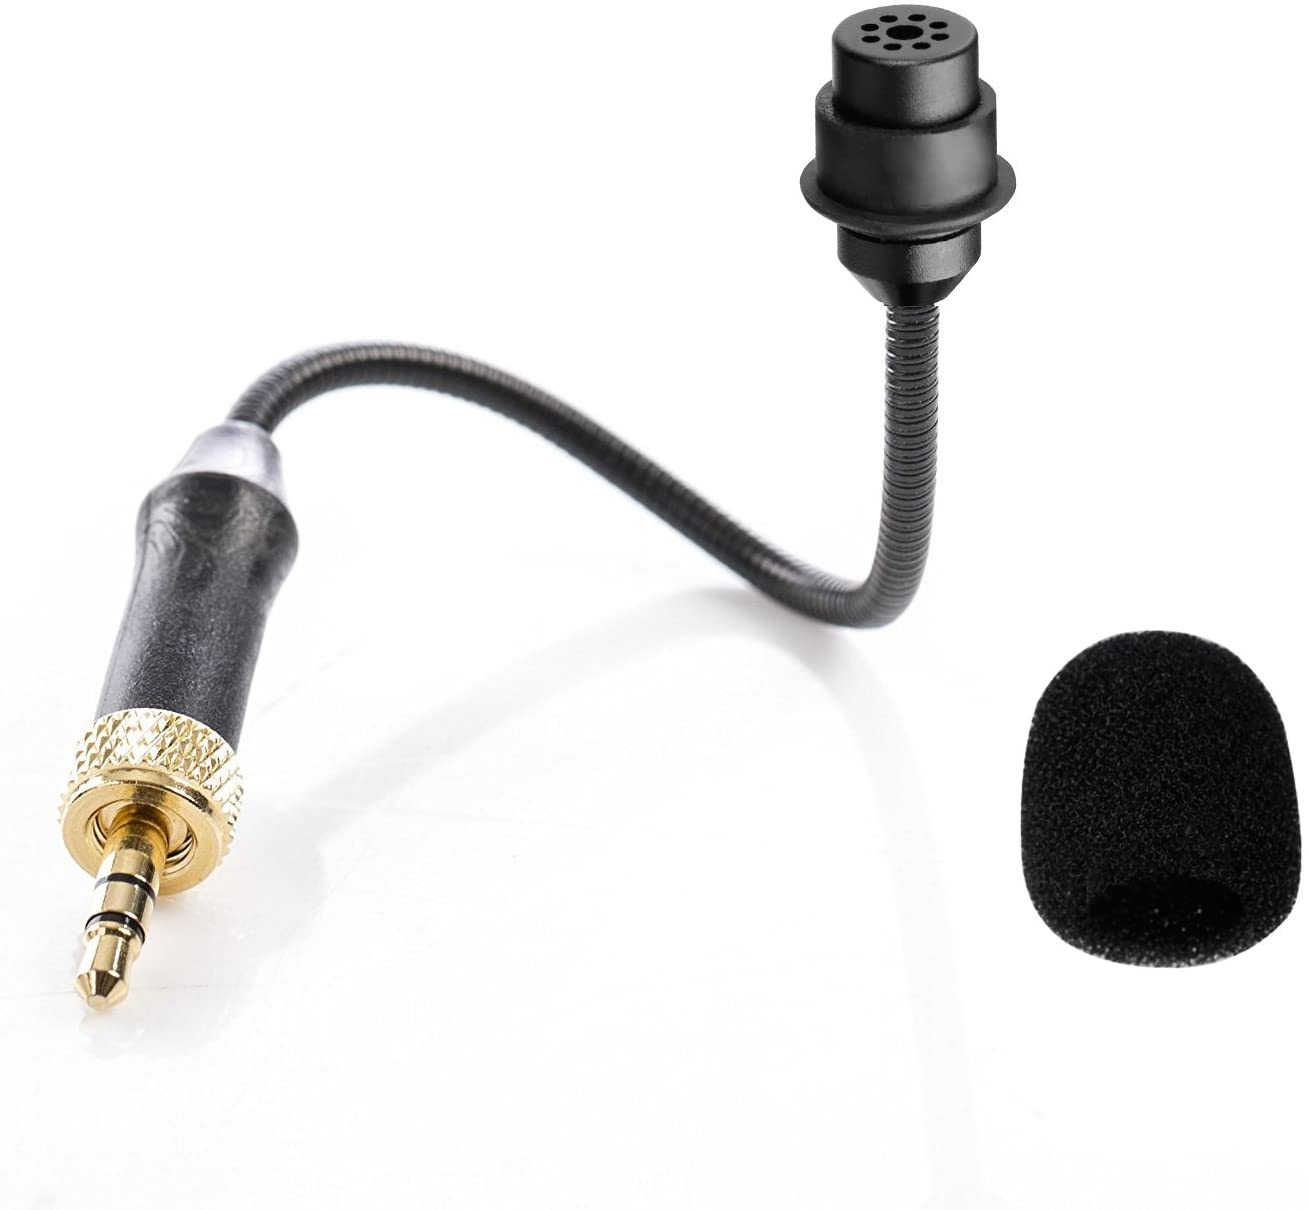 BOYA by-UM2 3.5mm TRS Locking-Type Gooseneck Omnidirectional Flexible Audio Microphone for Wireless Lavalier Microphone System BOYA by-WM4 BY-WM2G by-WM5 by-WM6 by-WM8 Saramonic UWMIC9 UWMIC15 System